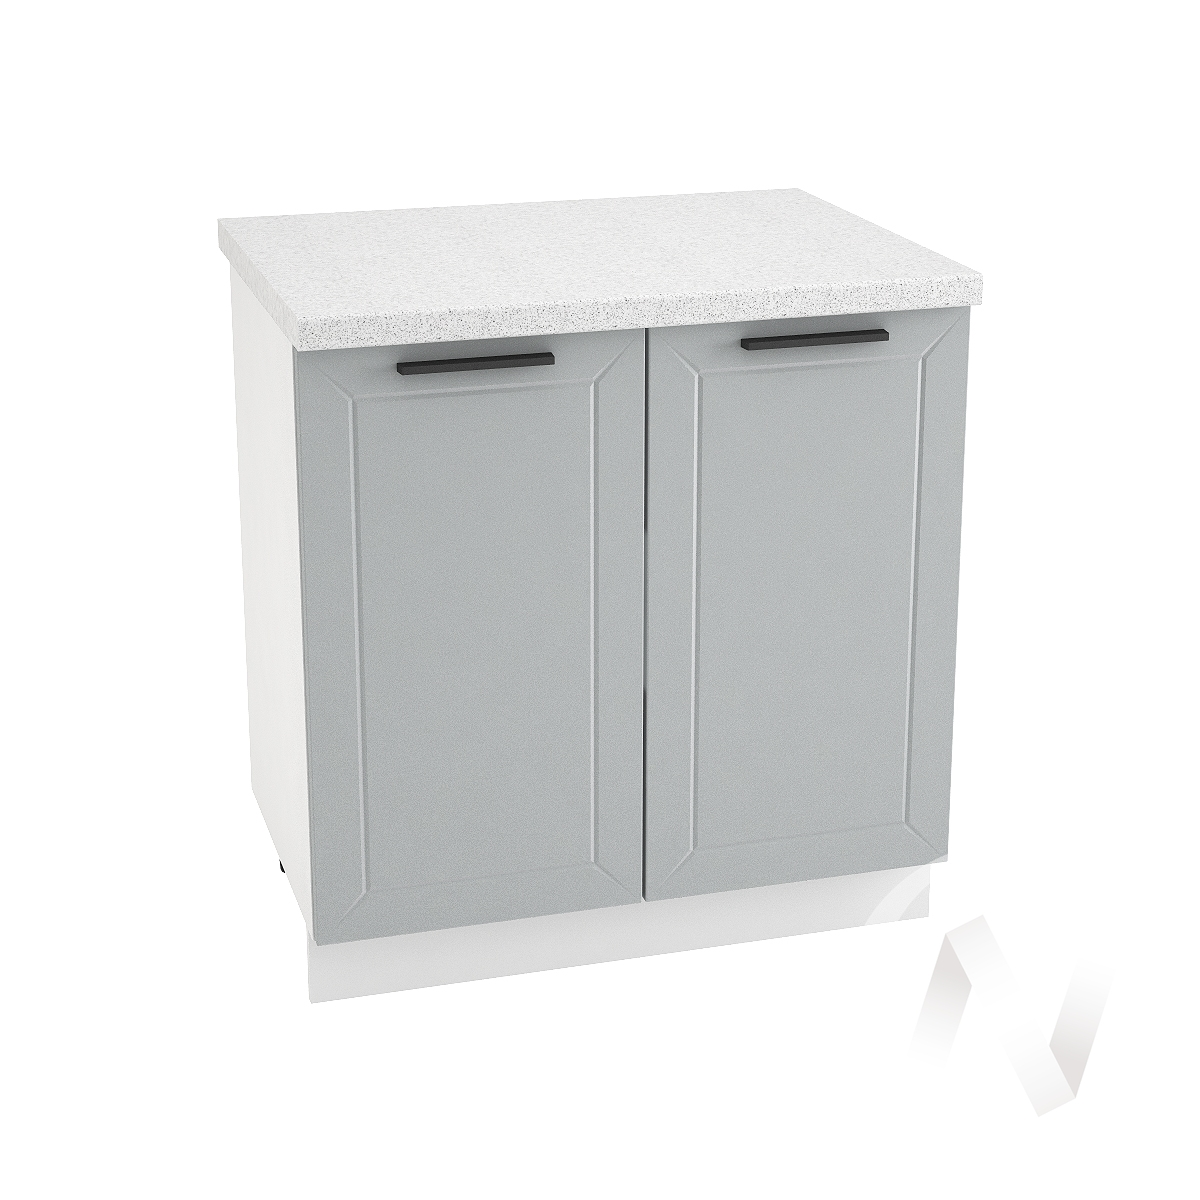 "Кухня ""Глетчер"": Шкаф нижний 800, ШН 800 (Гейнсборо силк/корпус белый)"